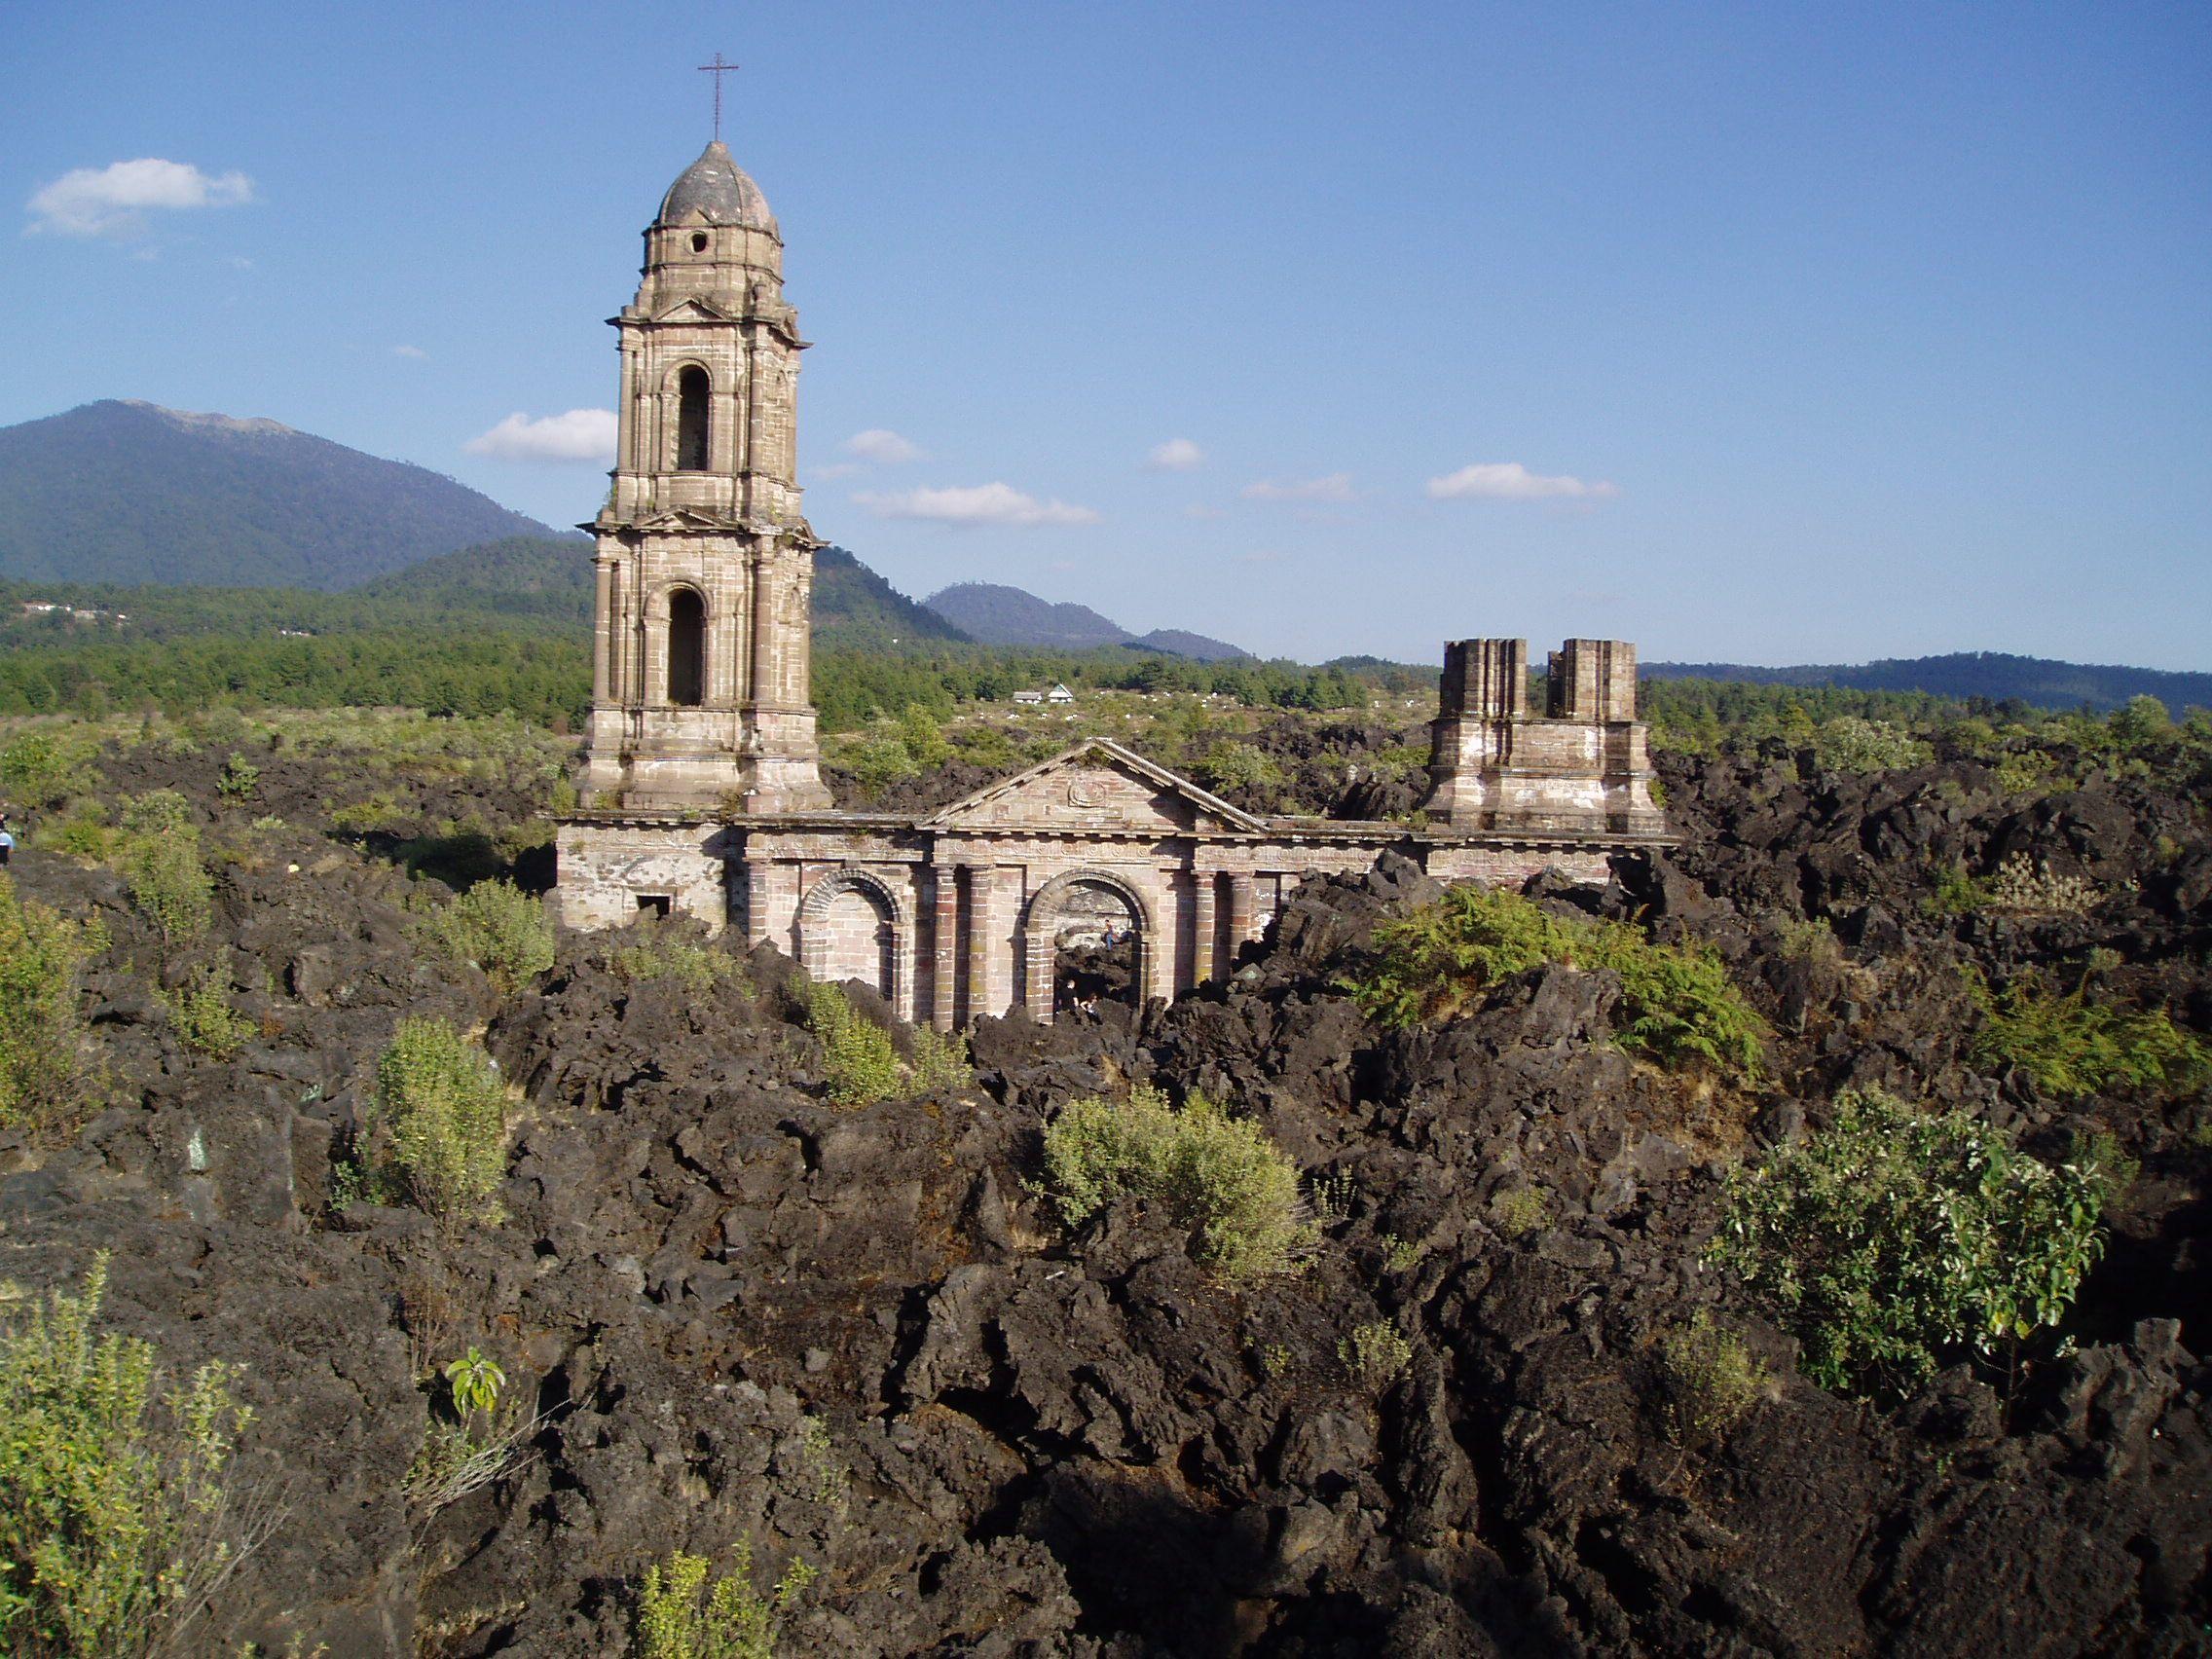 Nuevo San Juan Parangaricutiro, Michoacán, Mexico